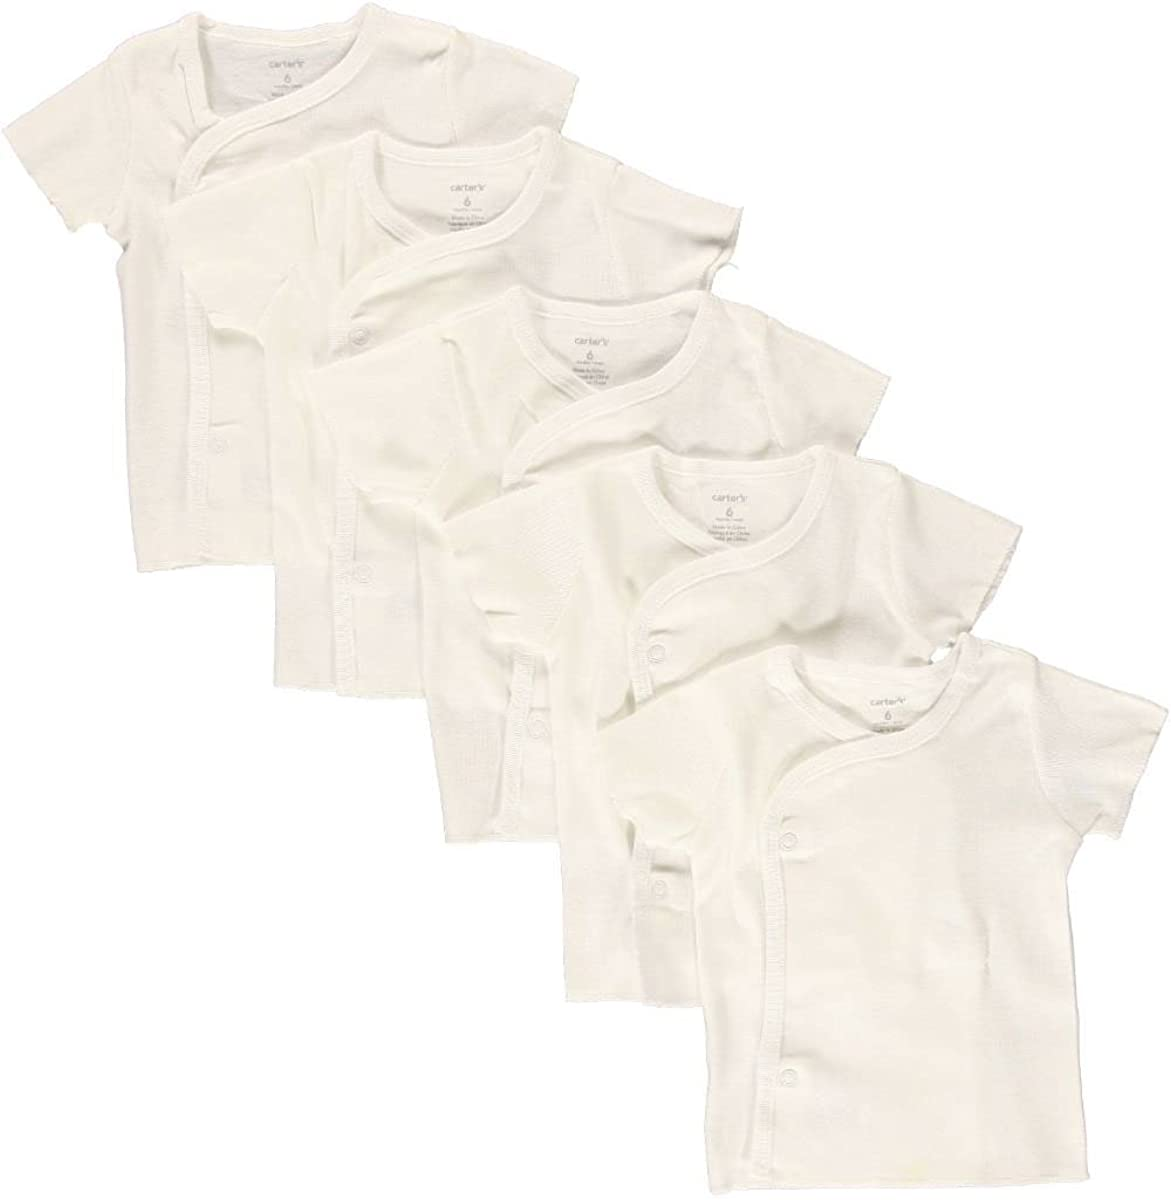 Carter's Baby Boys' New Outstanding Free Shipping Tees Kimono